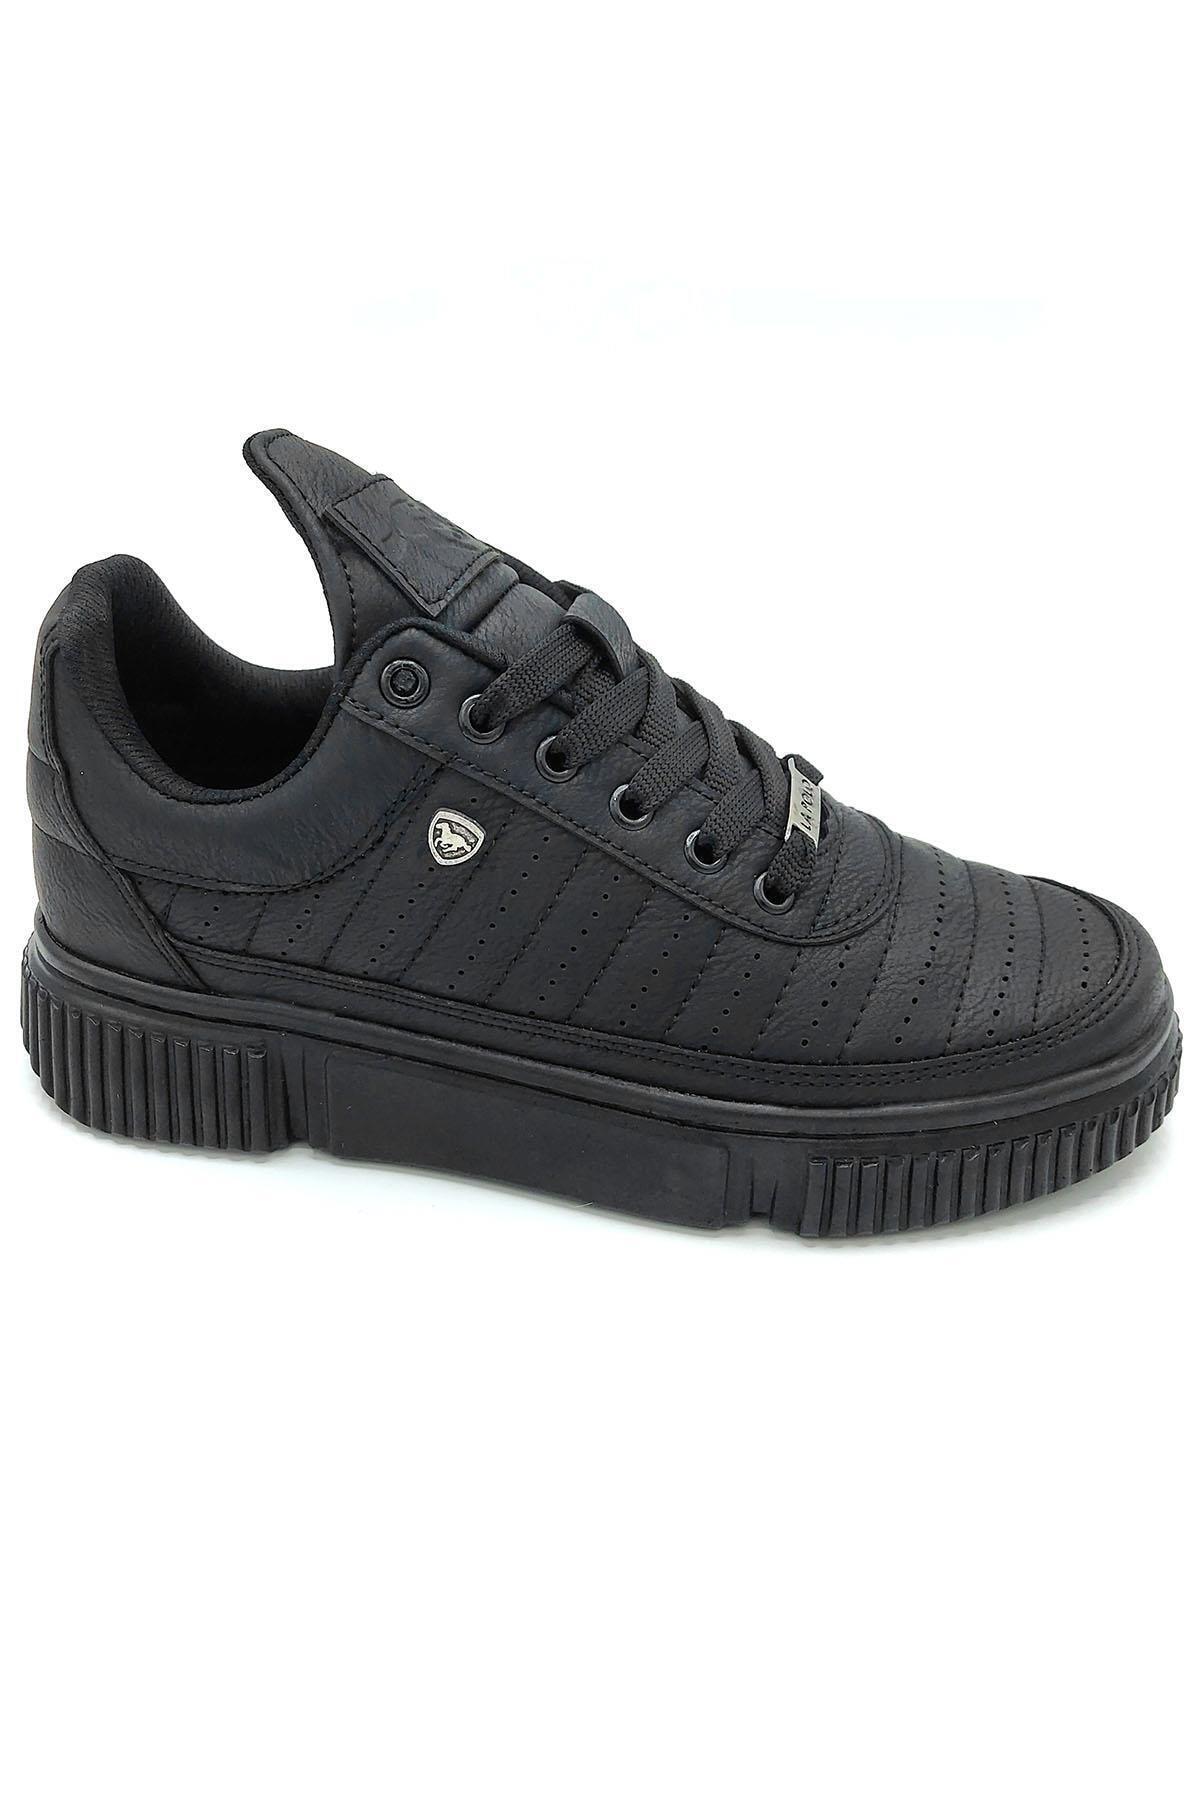 L.A Polo 071 Siyah Siyah Erkek Spor Ayakkabı 1